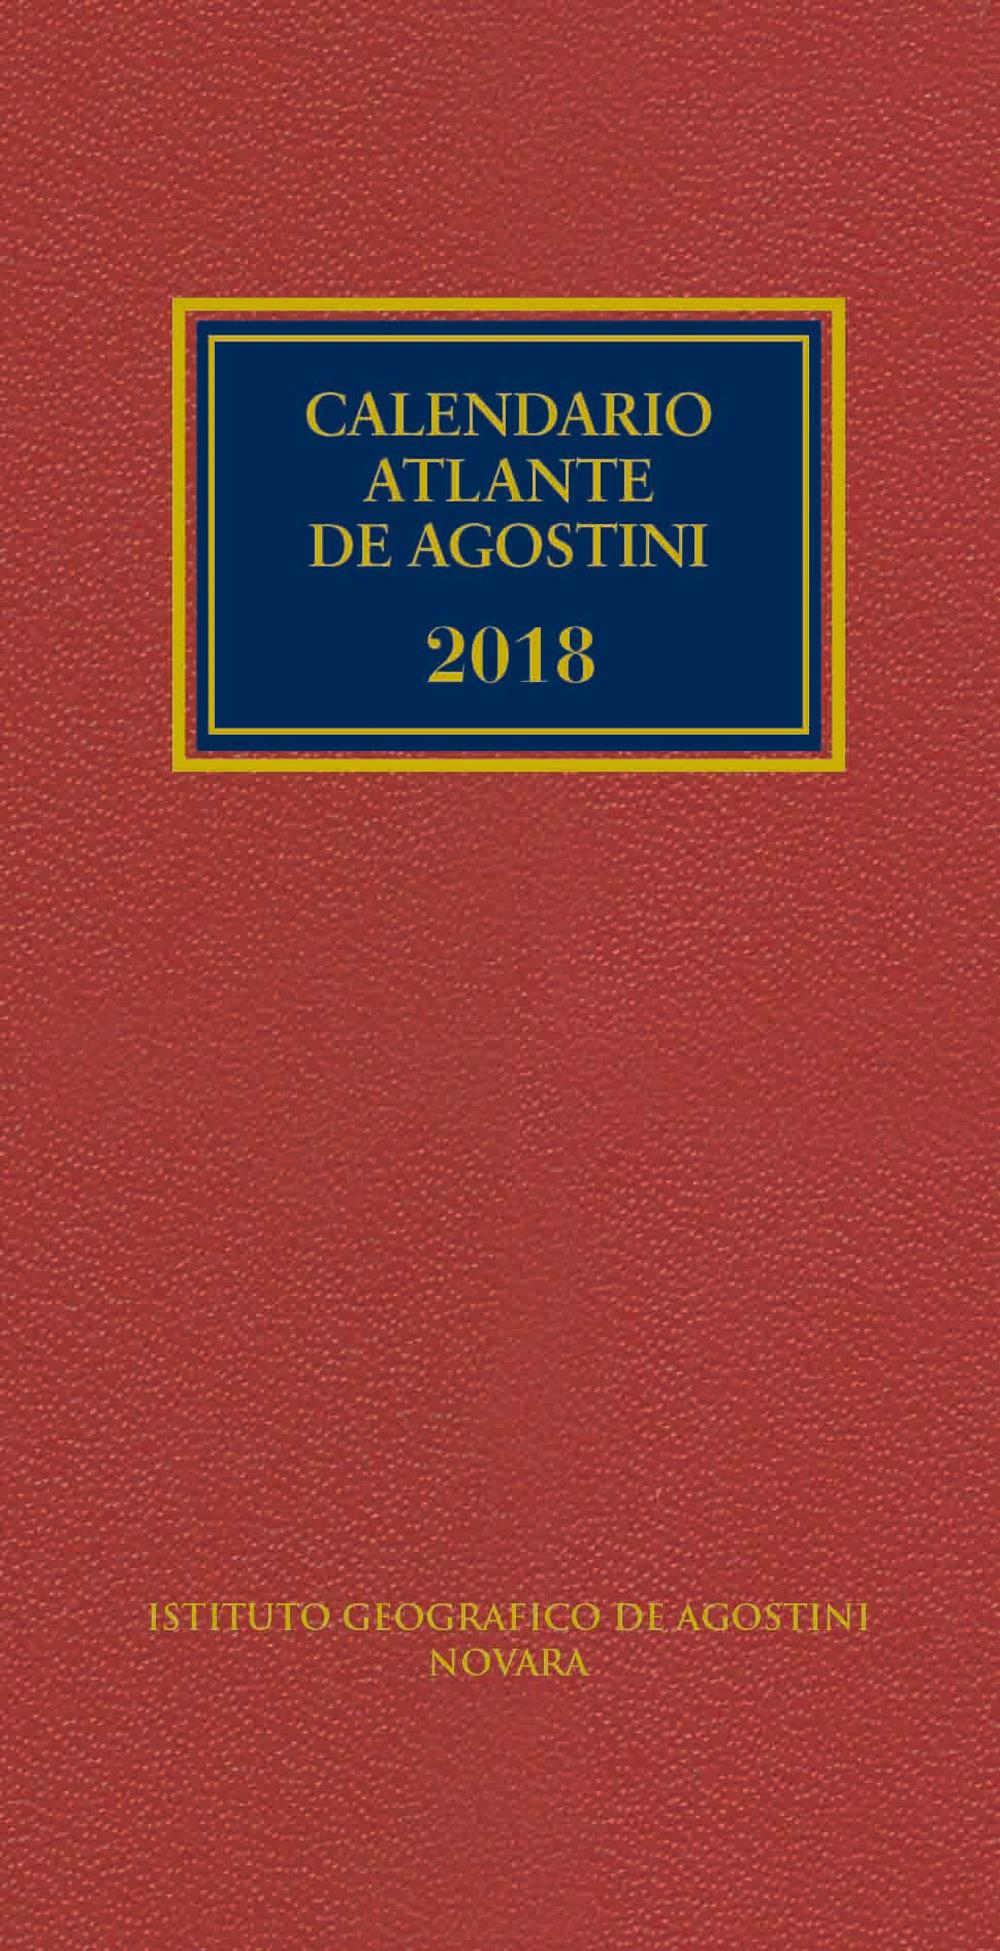 CALENDARIO ATLANTE DE AGOSTINI 2018 - 9788851151546